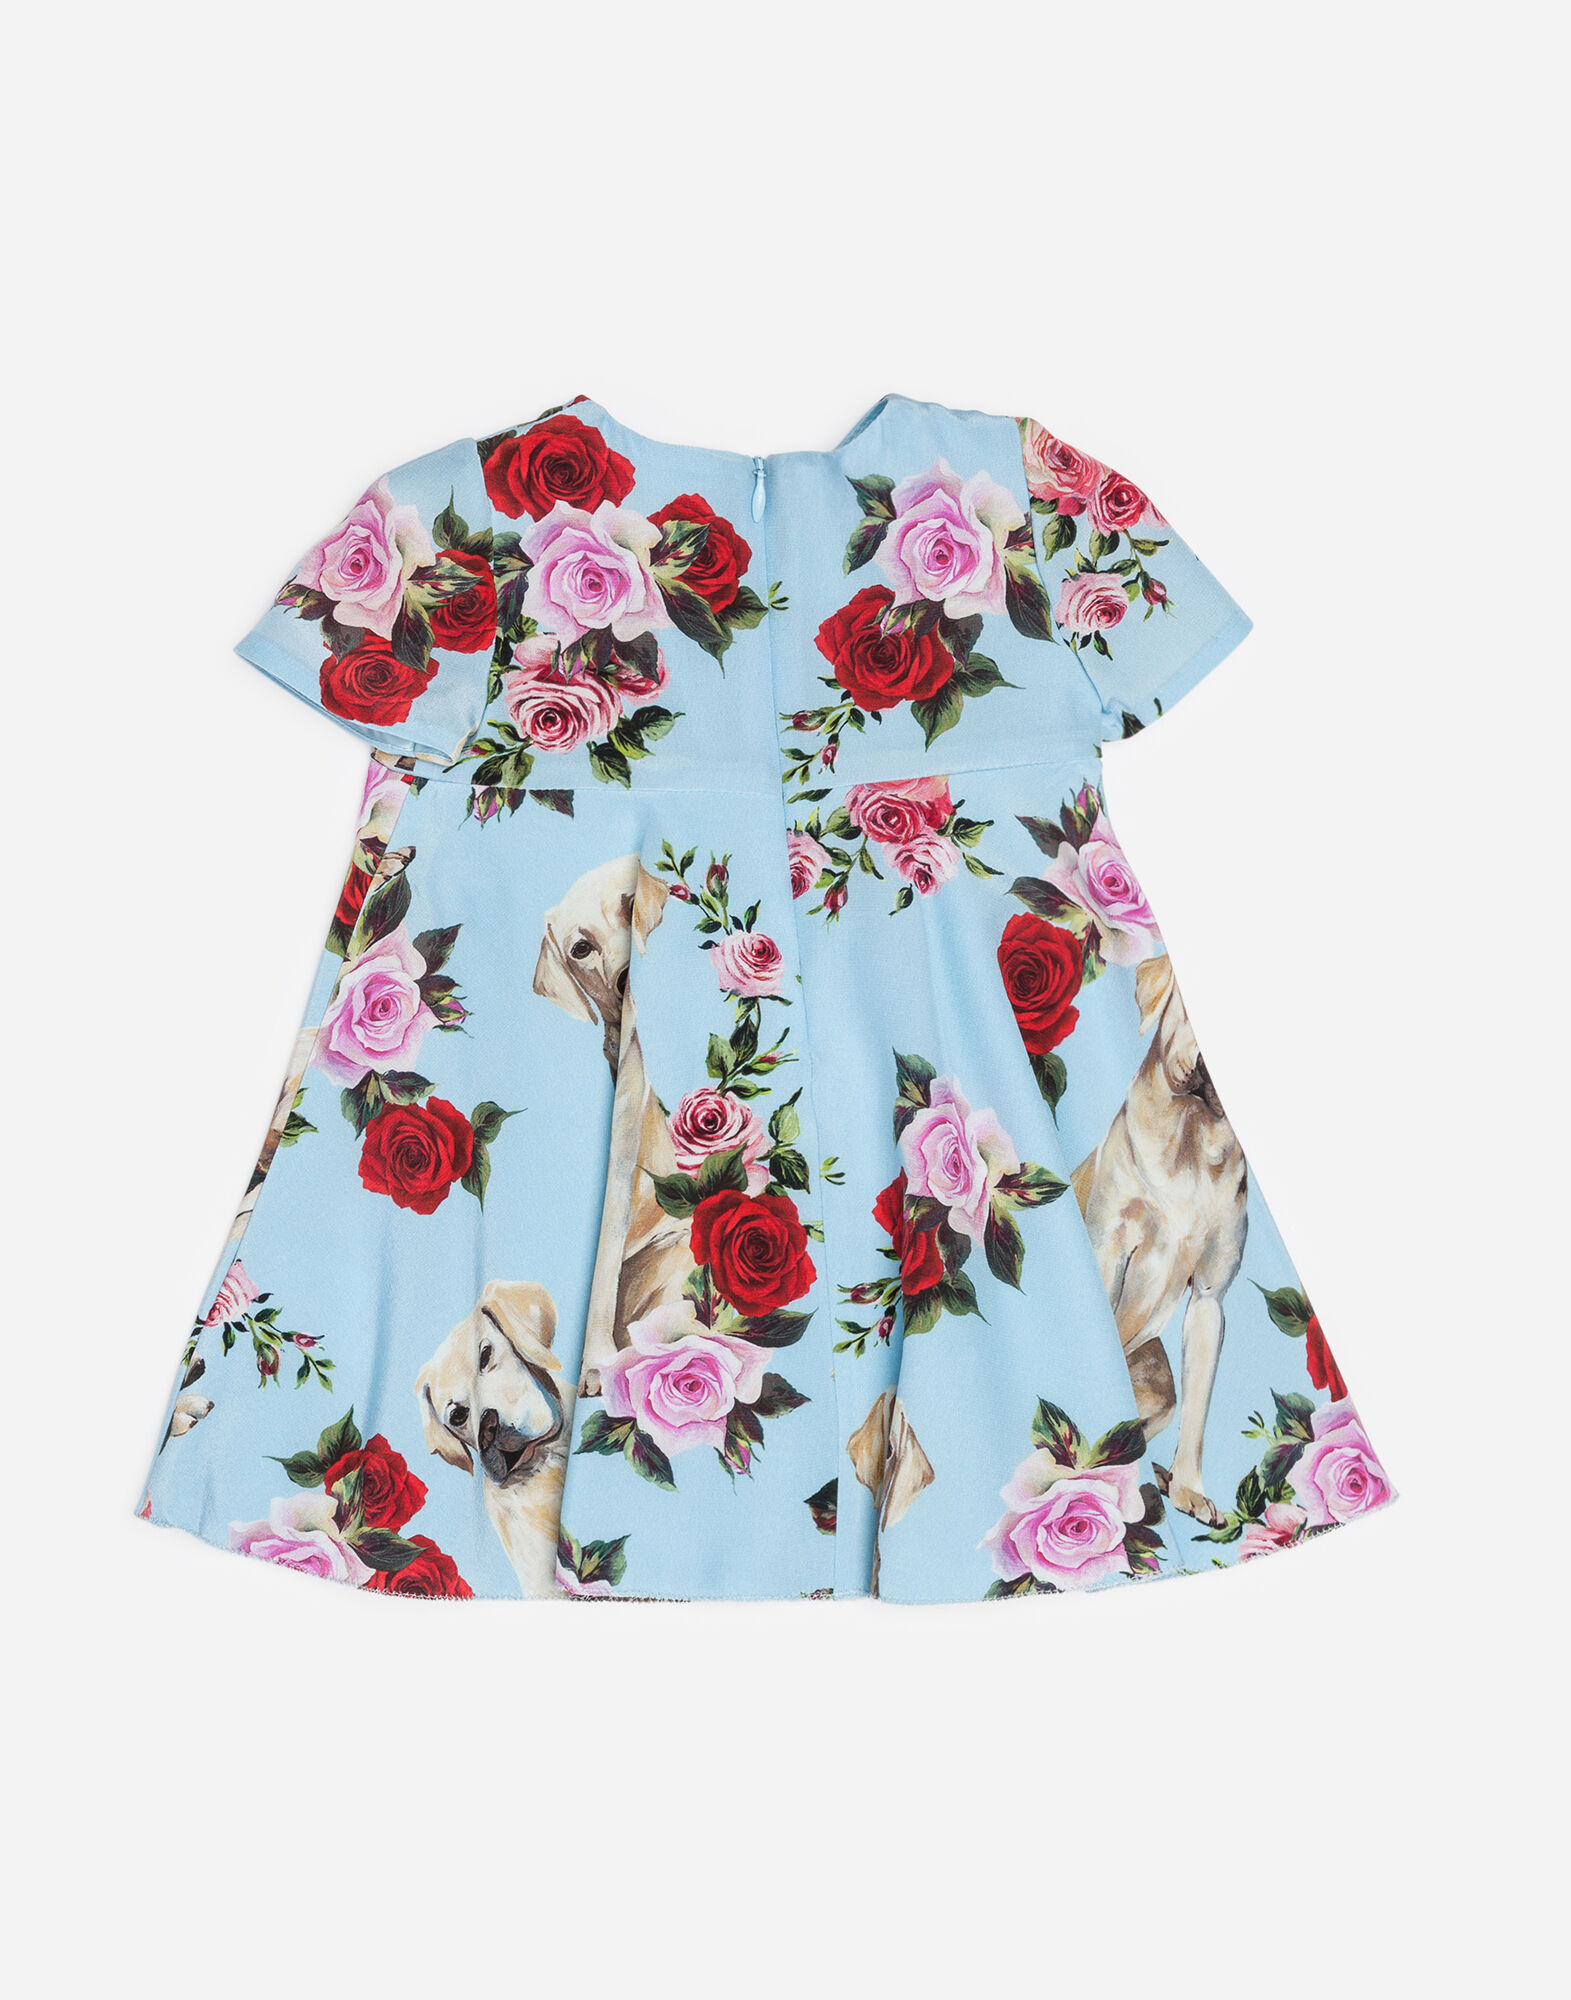 Dolce&Gabbana CREPE DE CHINE DRESS WITH MIMMO PRINT